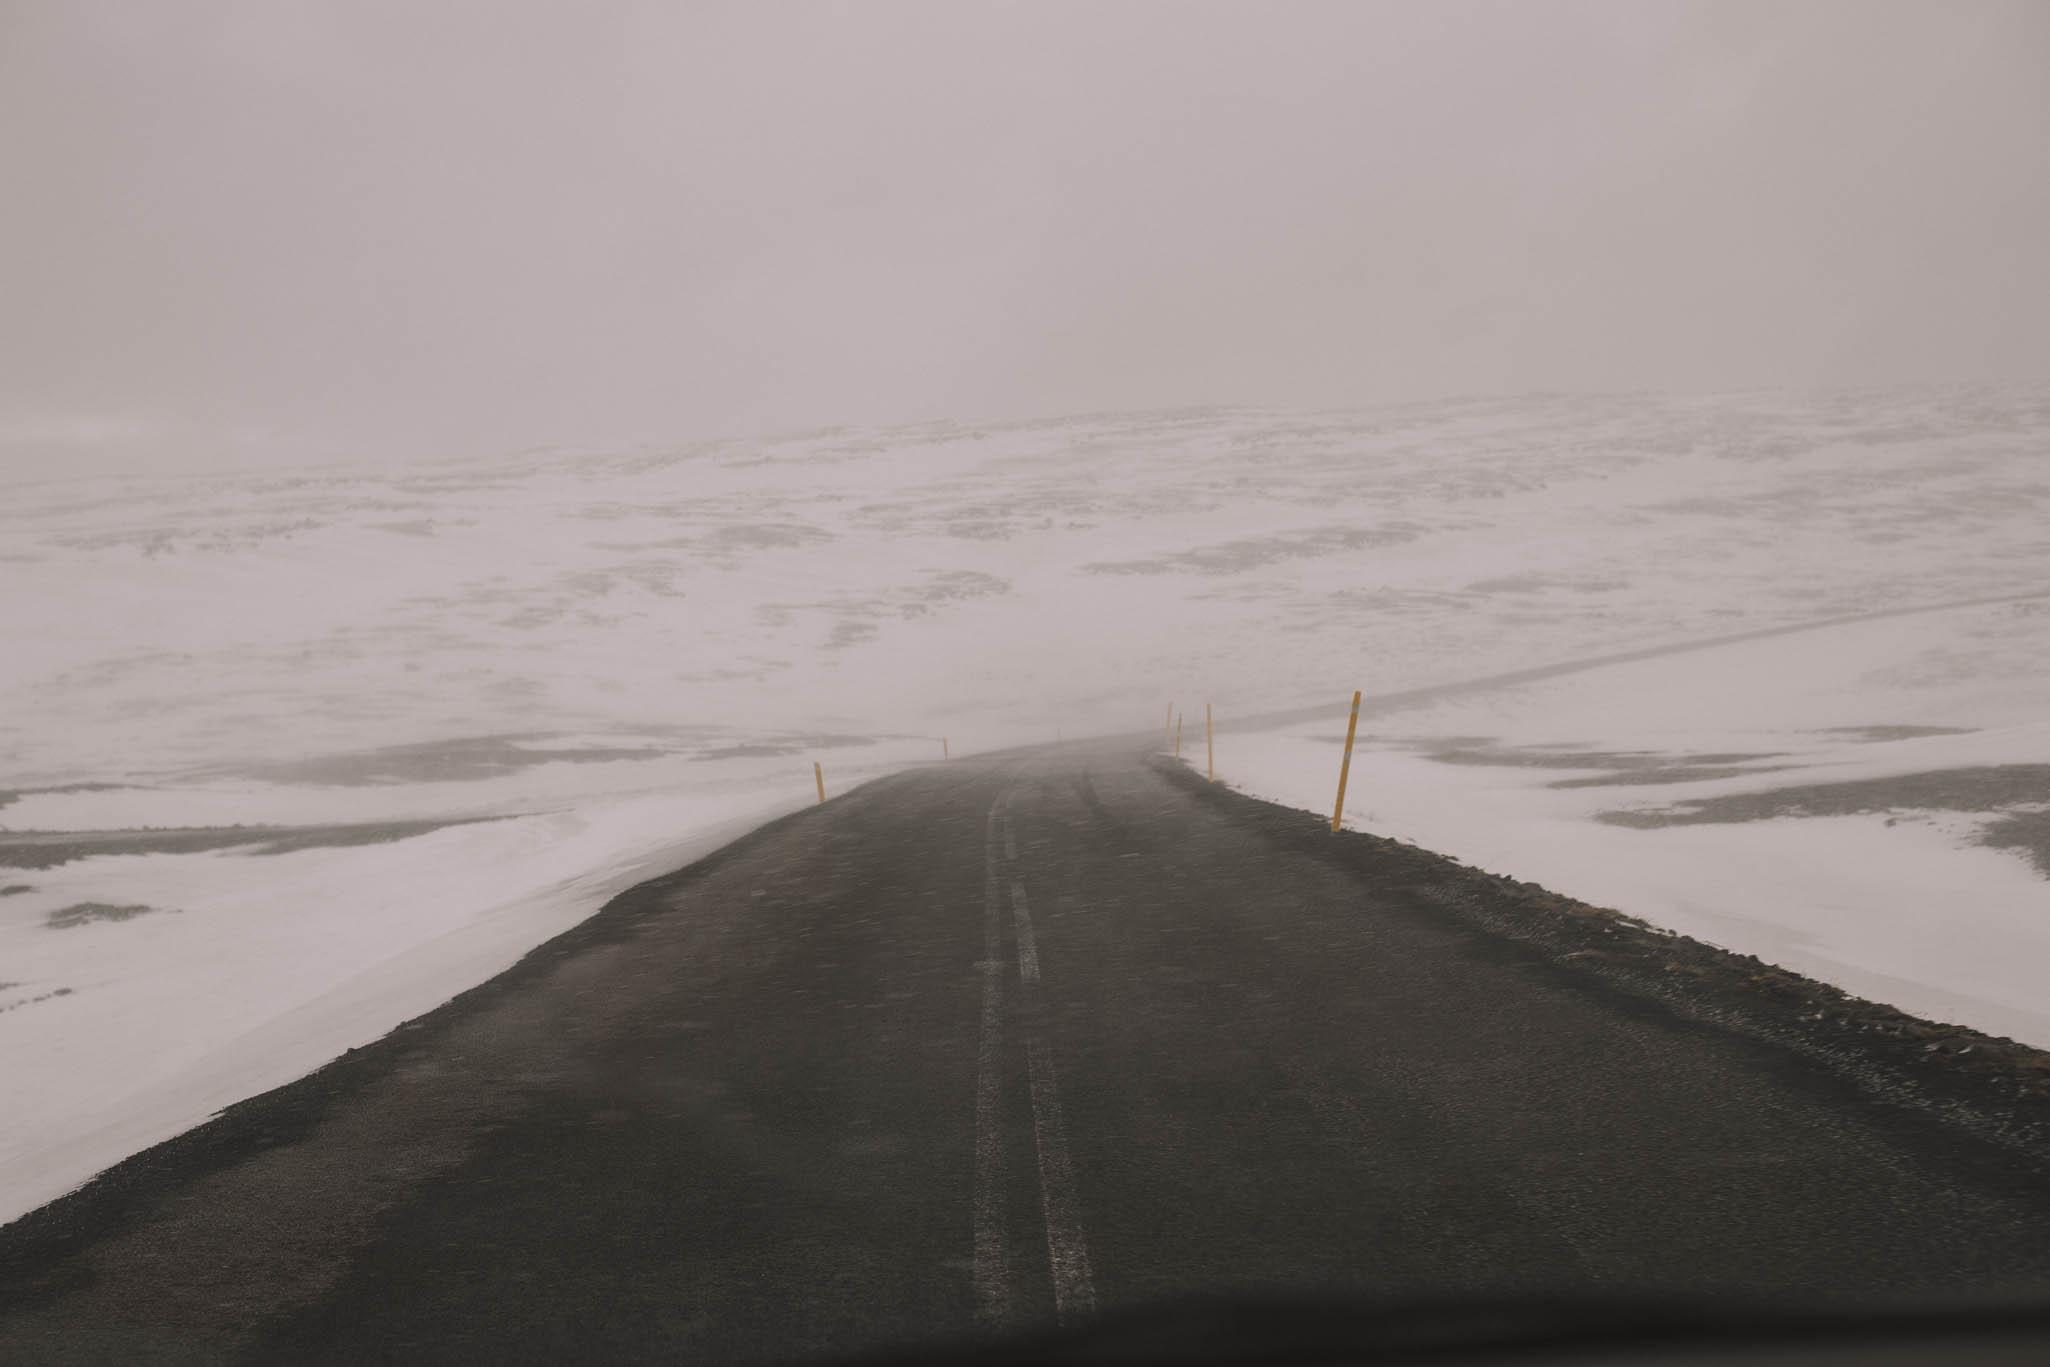 Road-trip-Islande-Iceland-Voyage-Travel-Portrait-Jérémy-Boyer-mountain-montagne-snow-storm-tempete-neige-4.jpg